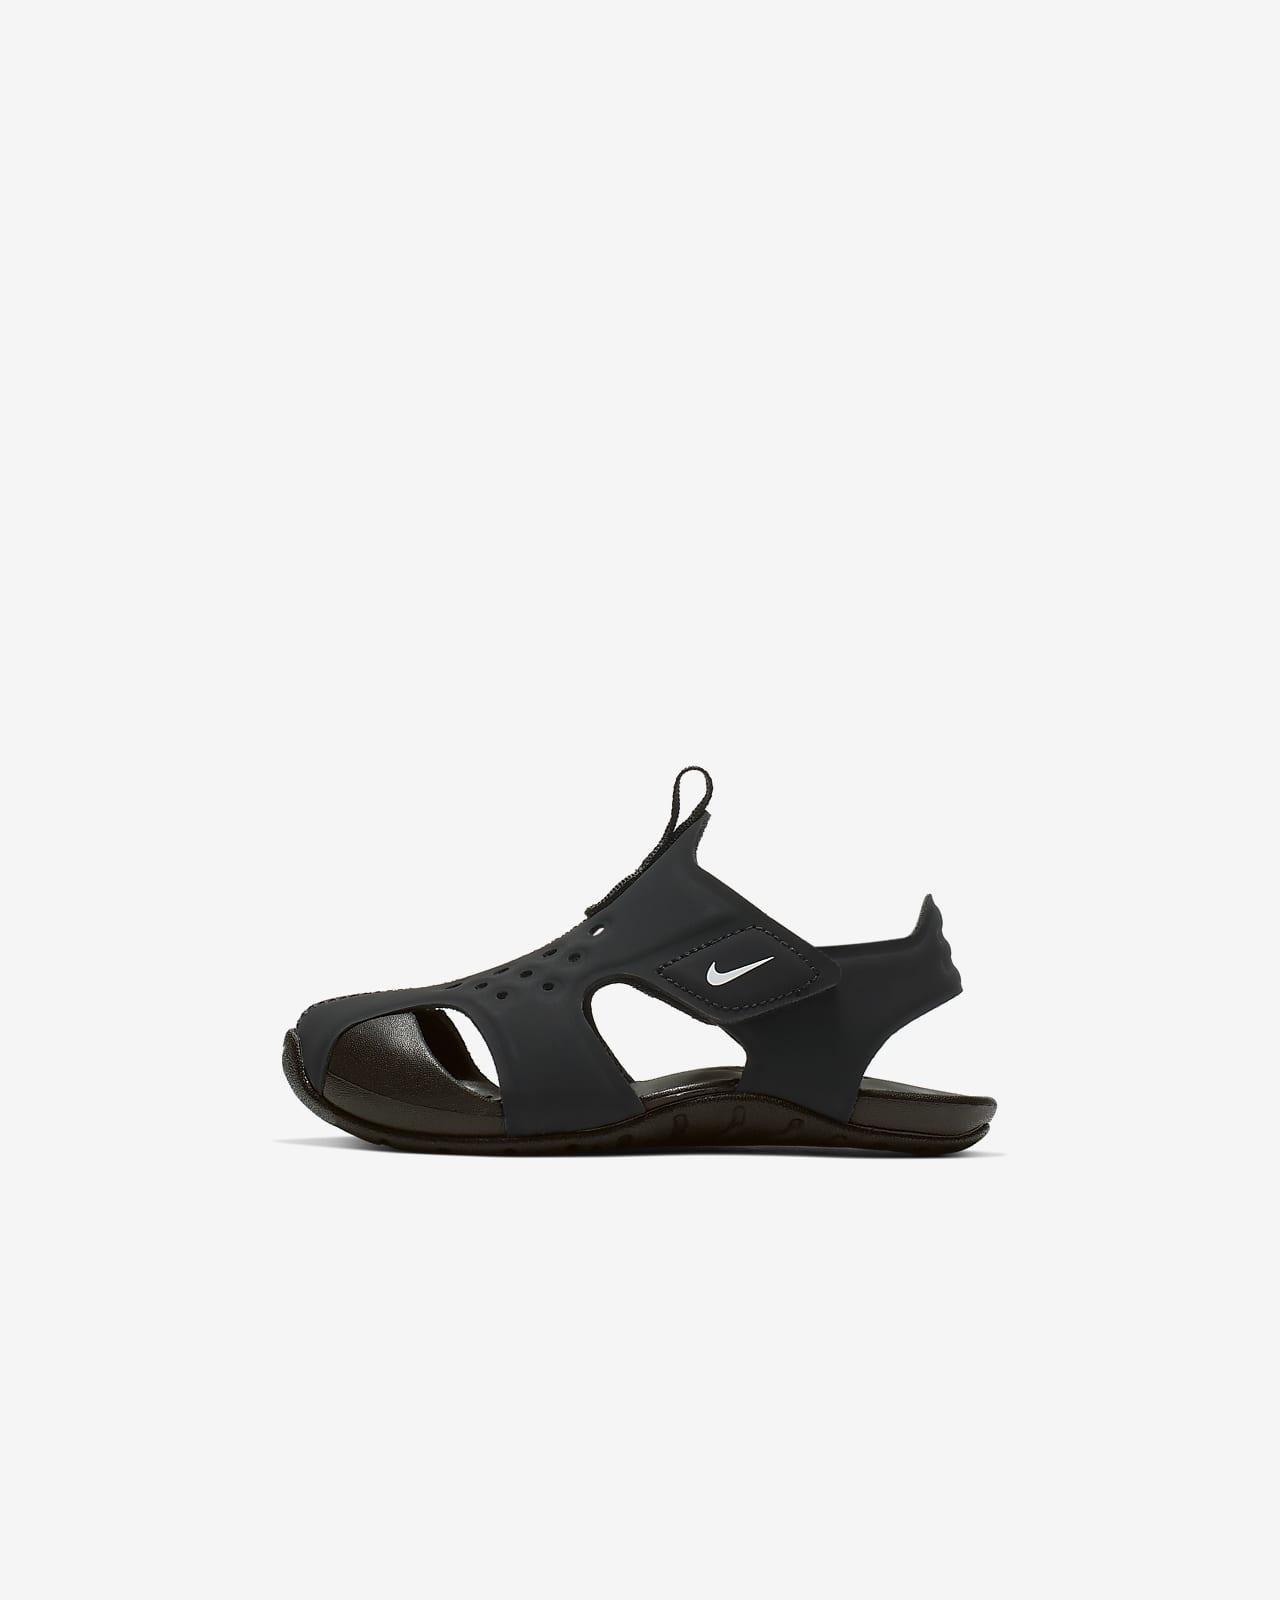 Nike Sunray Protect 2 Baby/Toddler Sandal